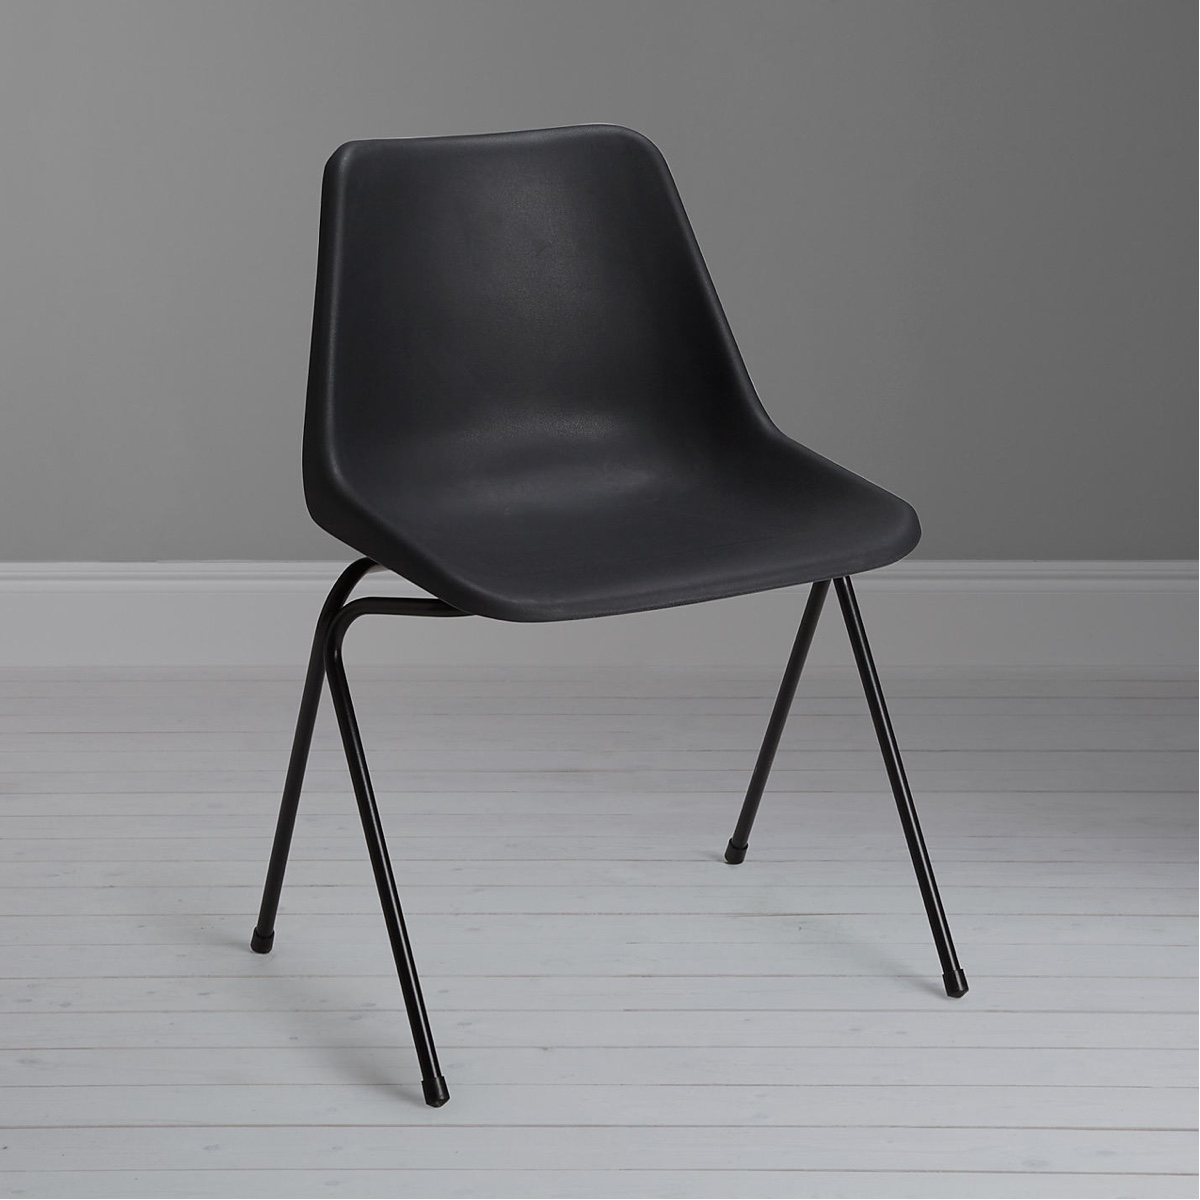 Polyside Chair in dark grey. Image© John Lewis Partnership.